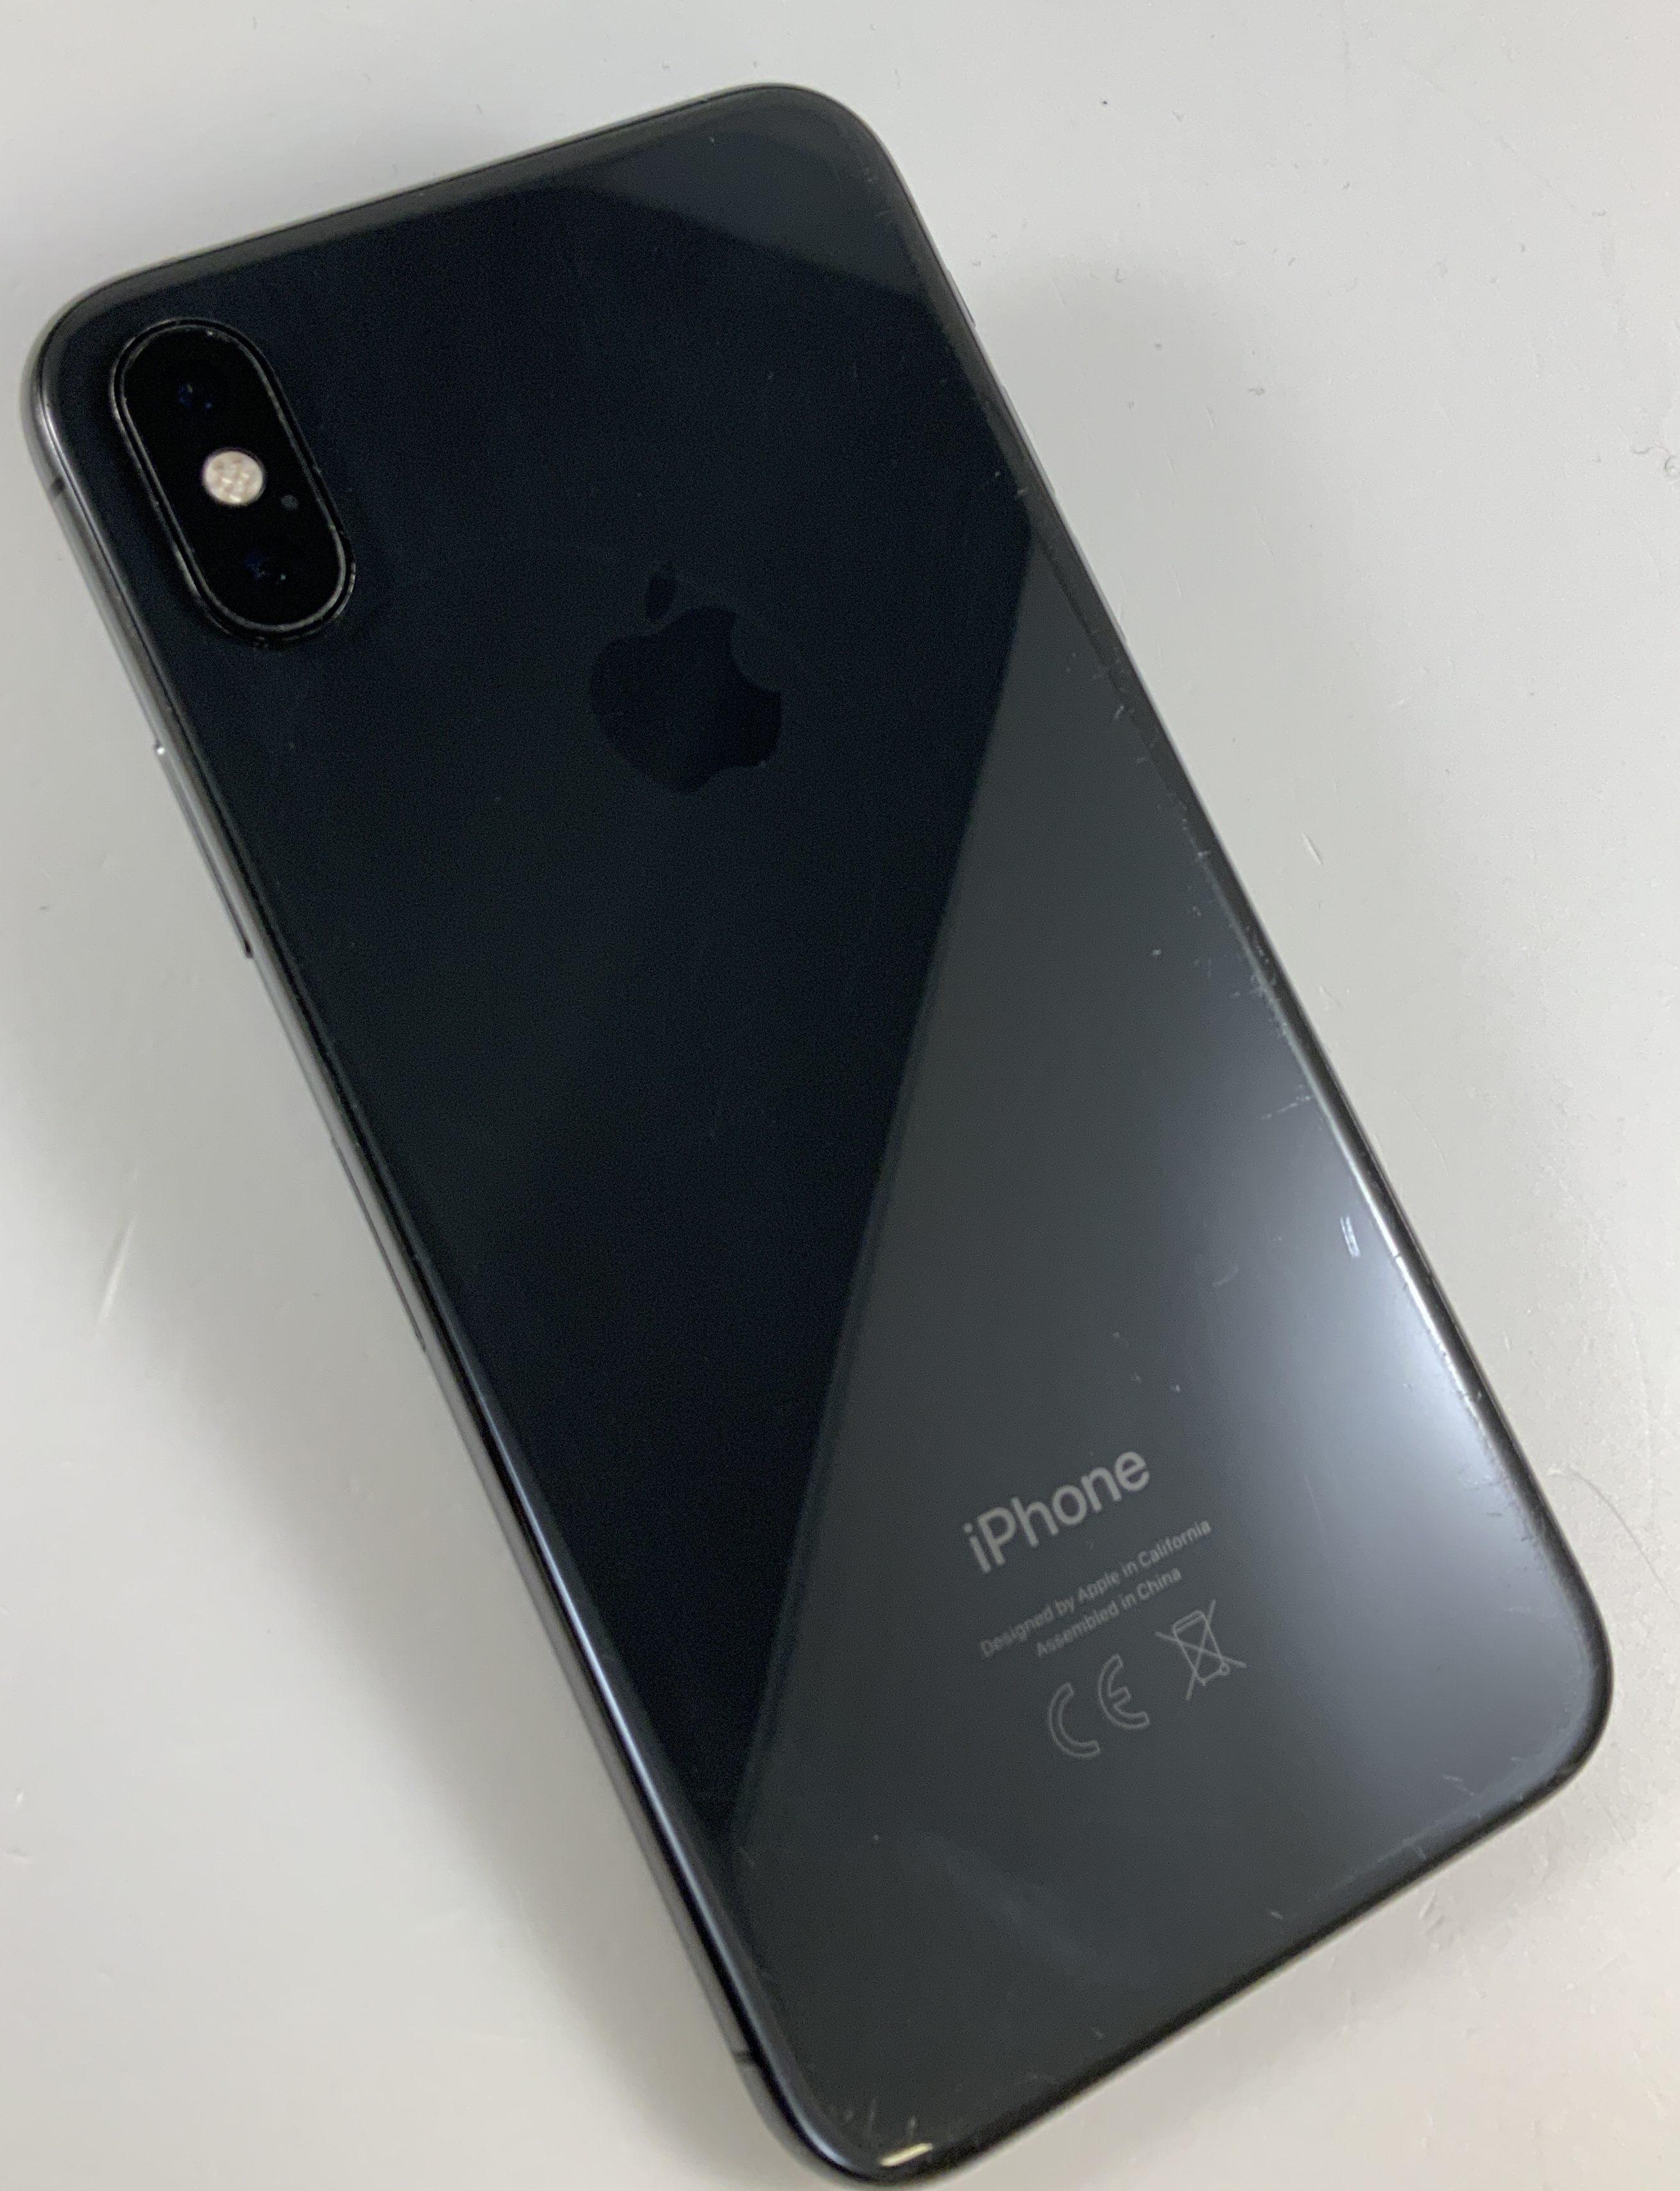 iPhone XS 256GB, 256GB, Space Gray, immagine 3